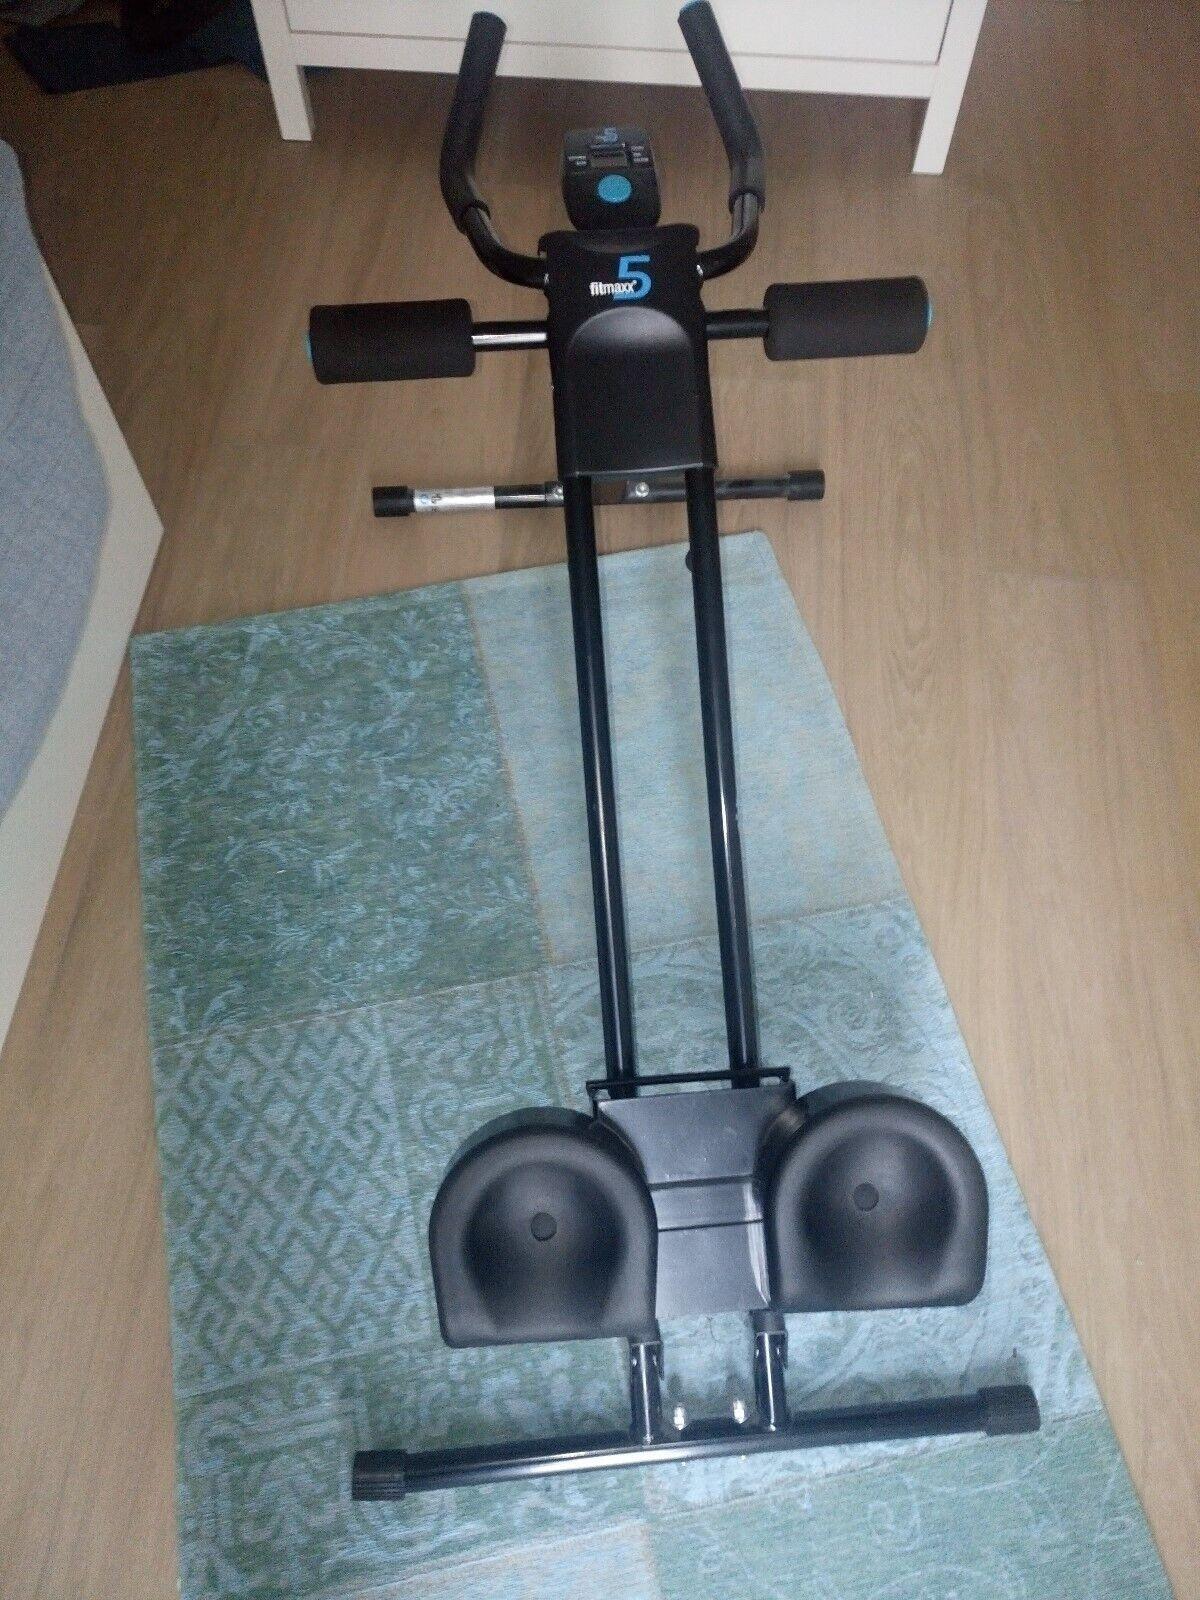 VITALmaxx fitmaxx 5 Bauch Rücken Trainer Sport Fitness Gerät Krafttraining Shape